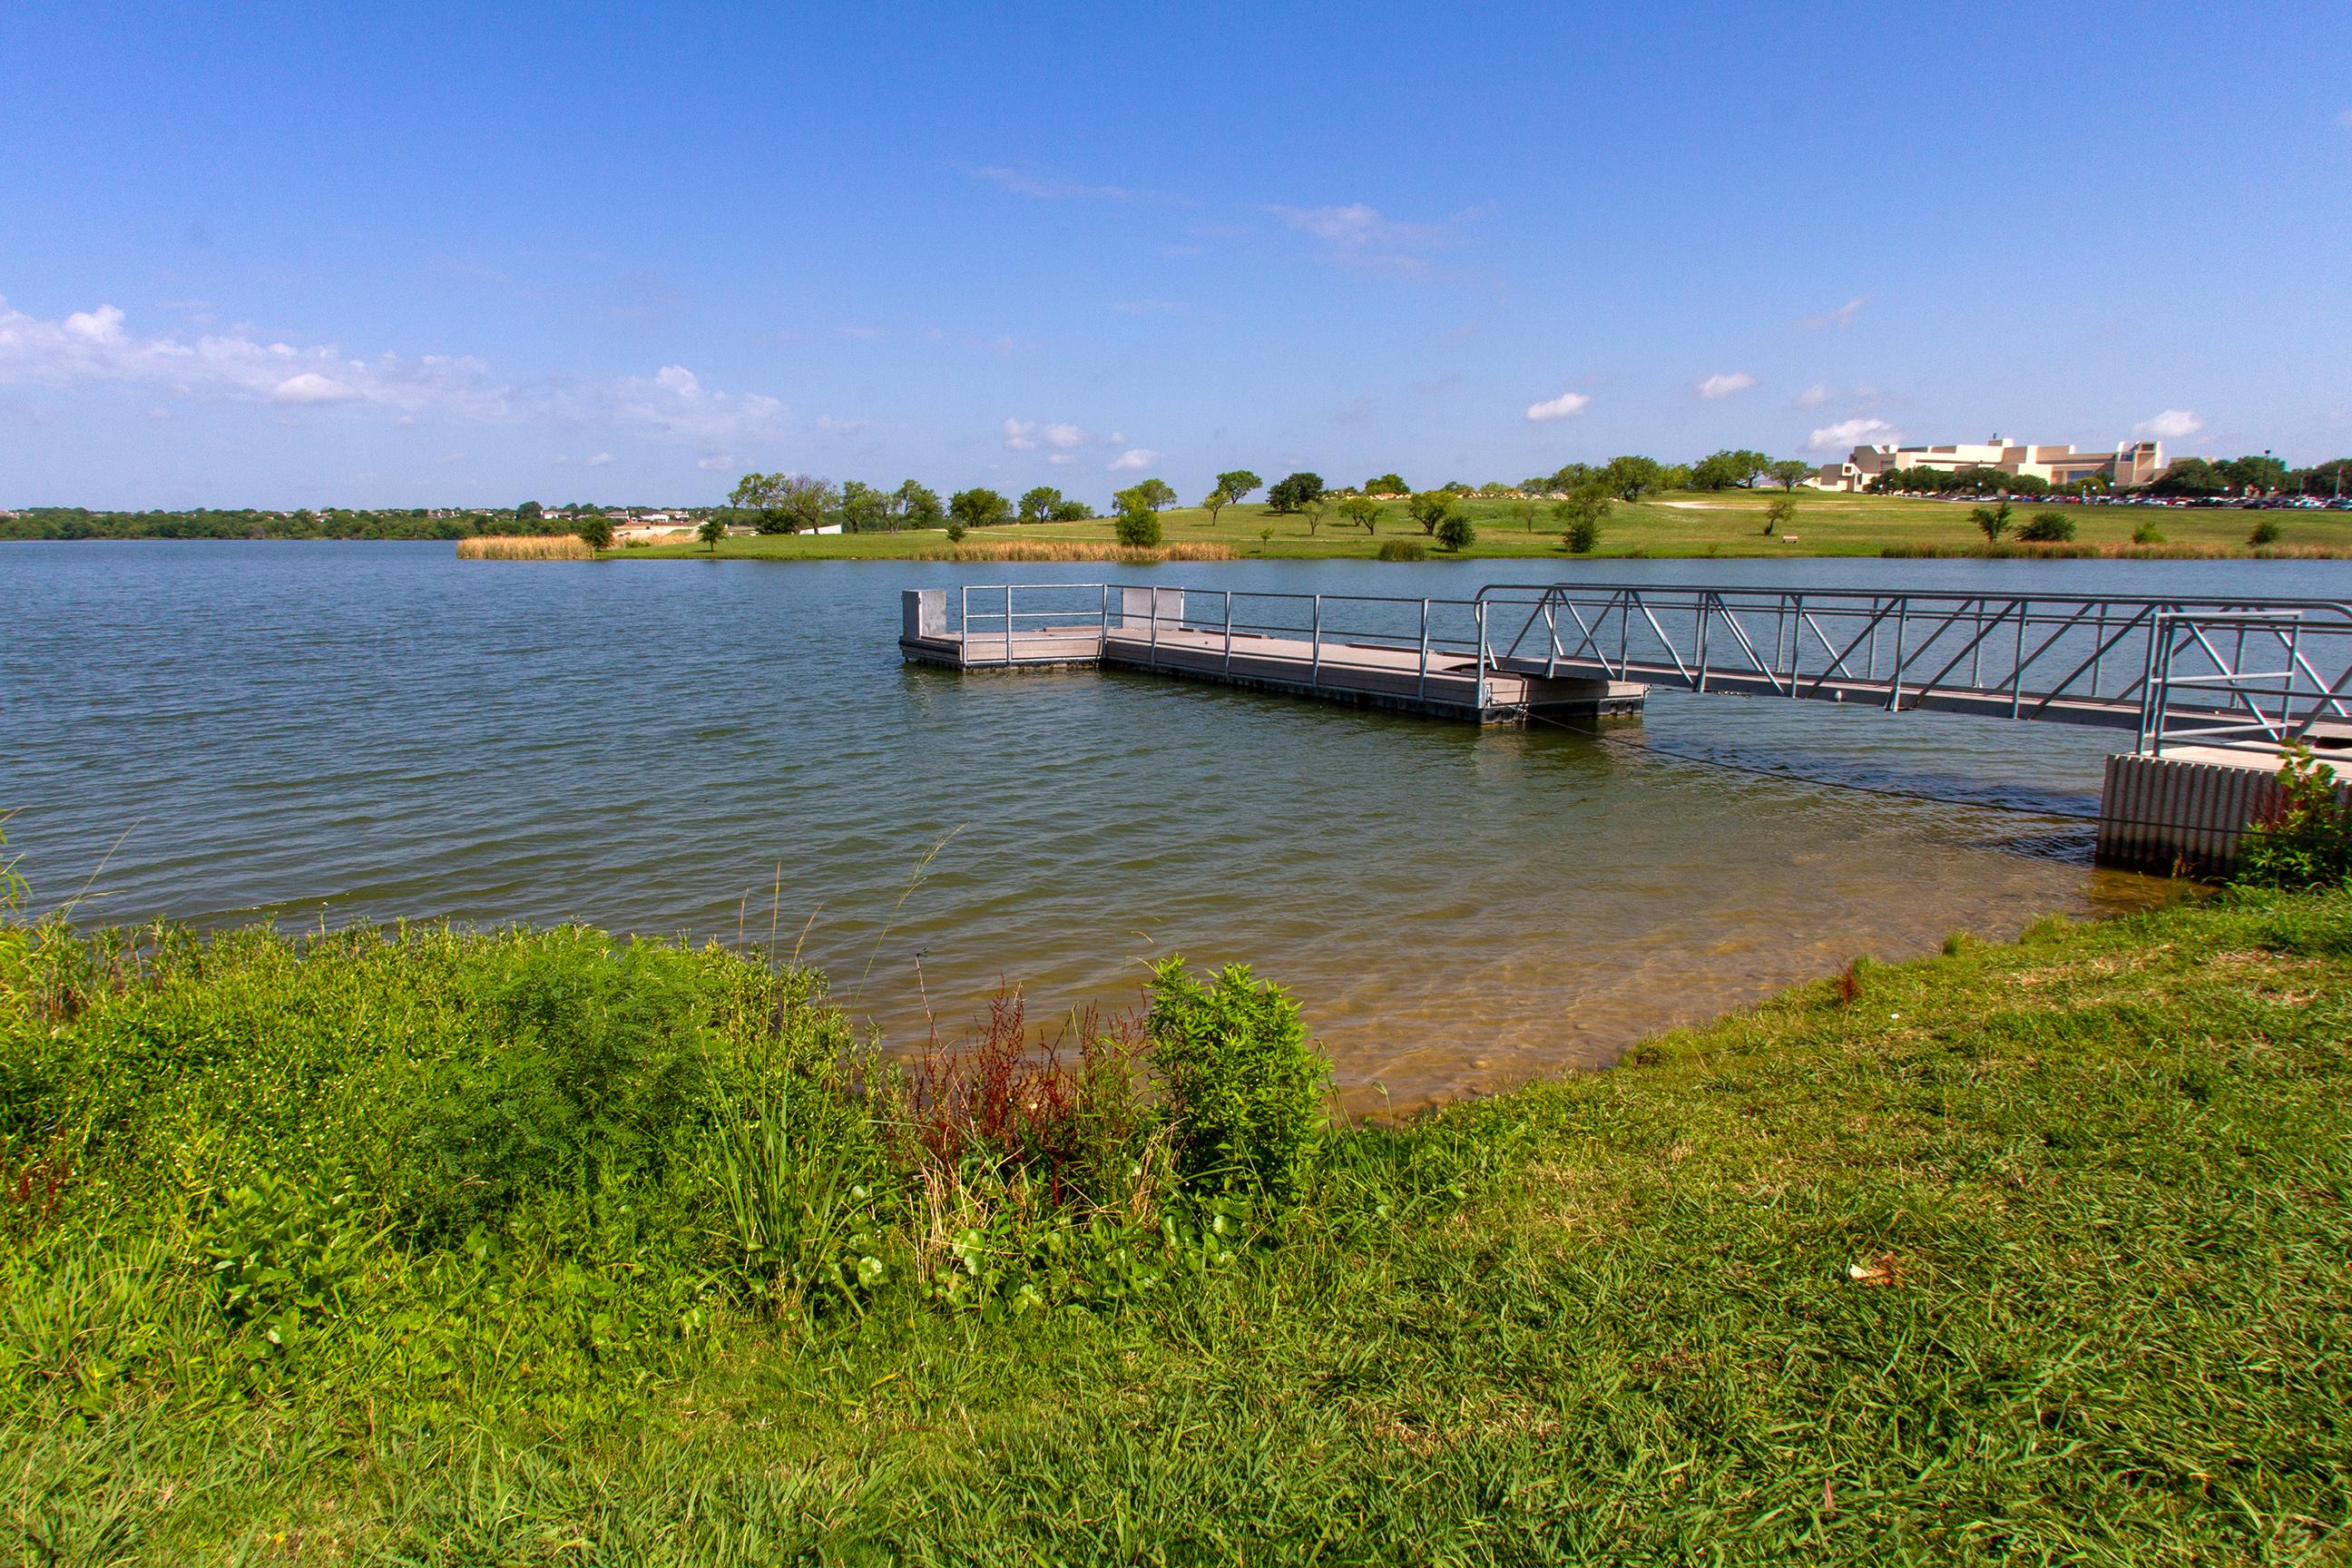 Marine Creek offers peaceful recreation